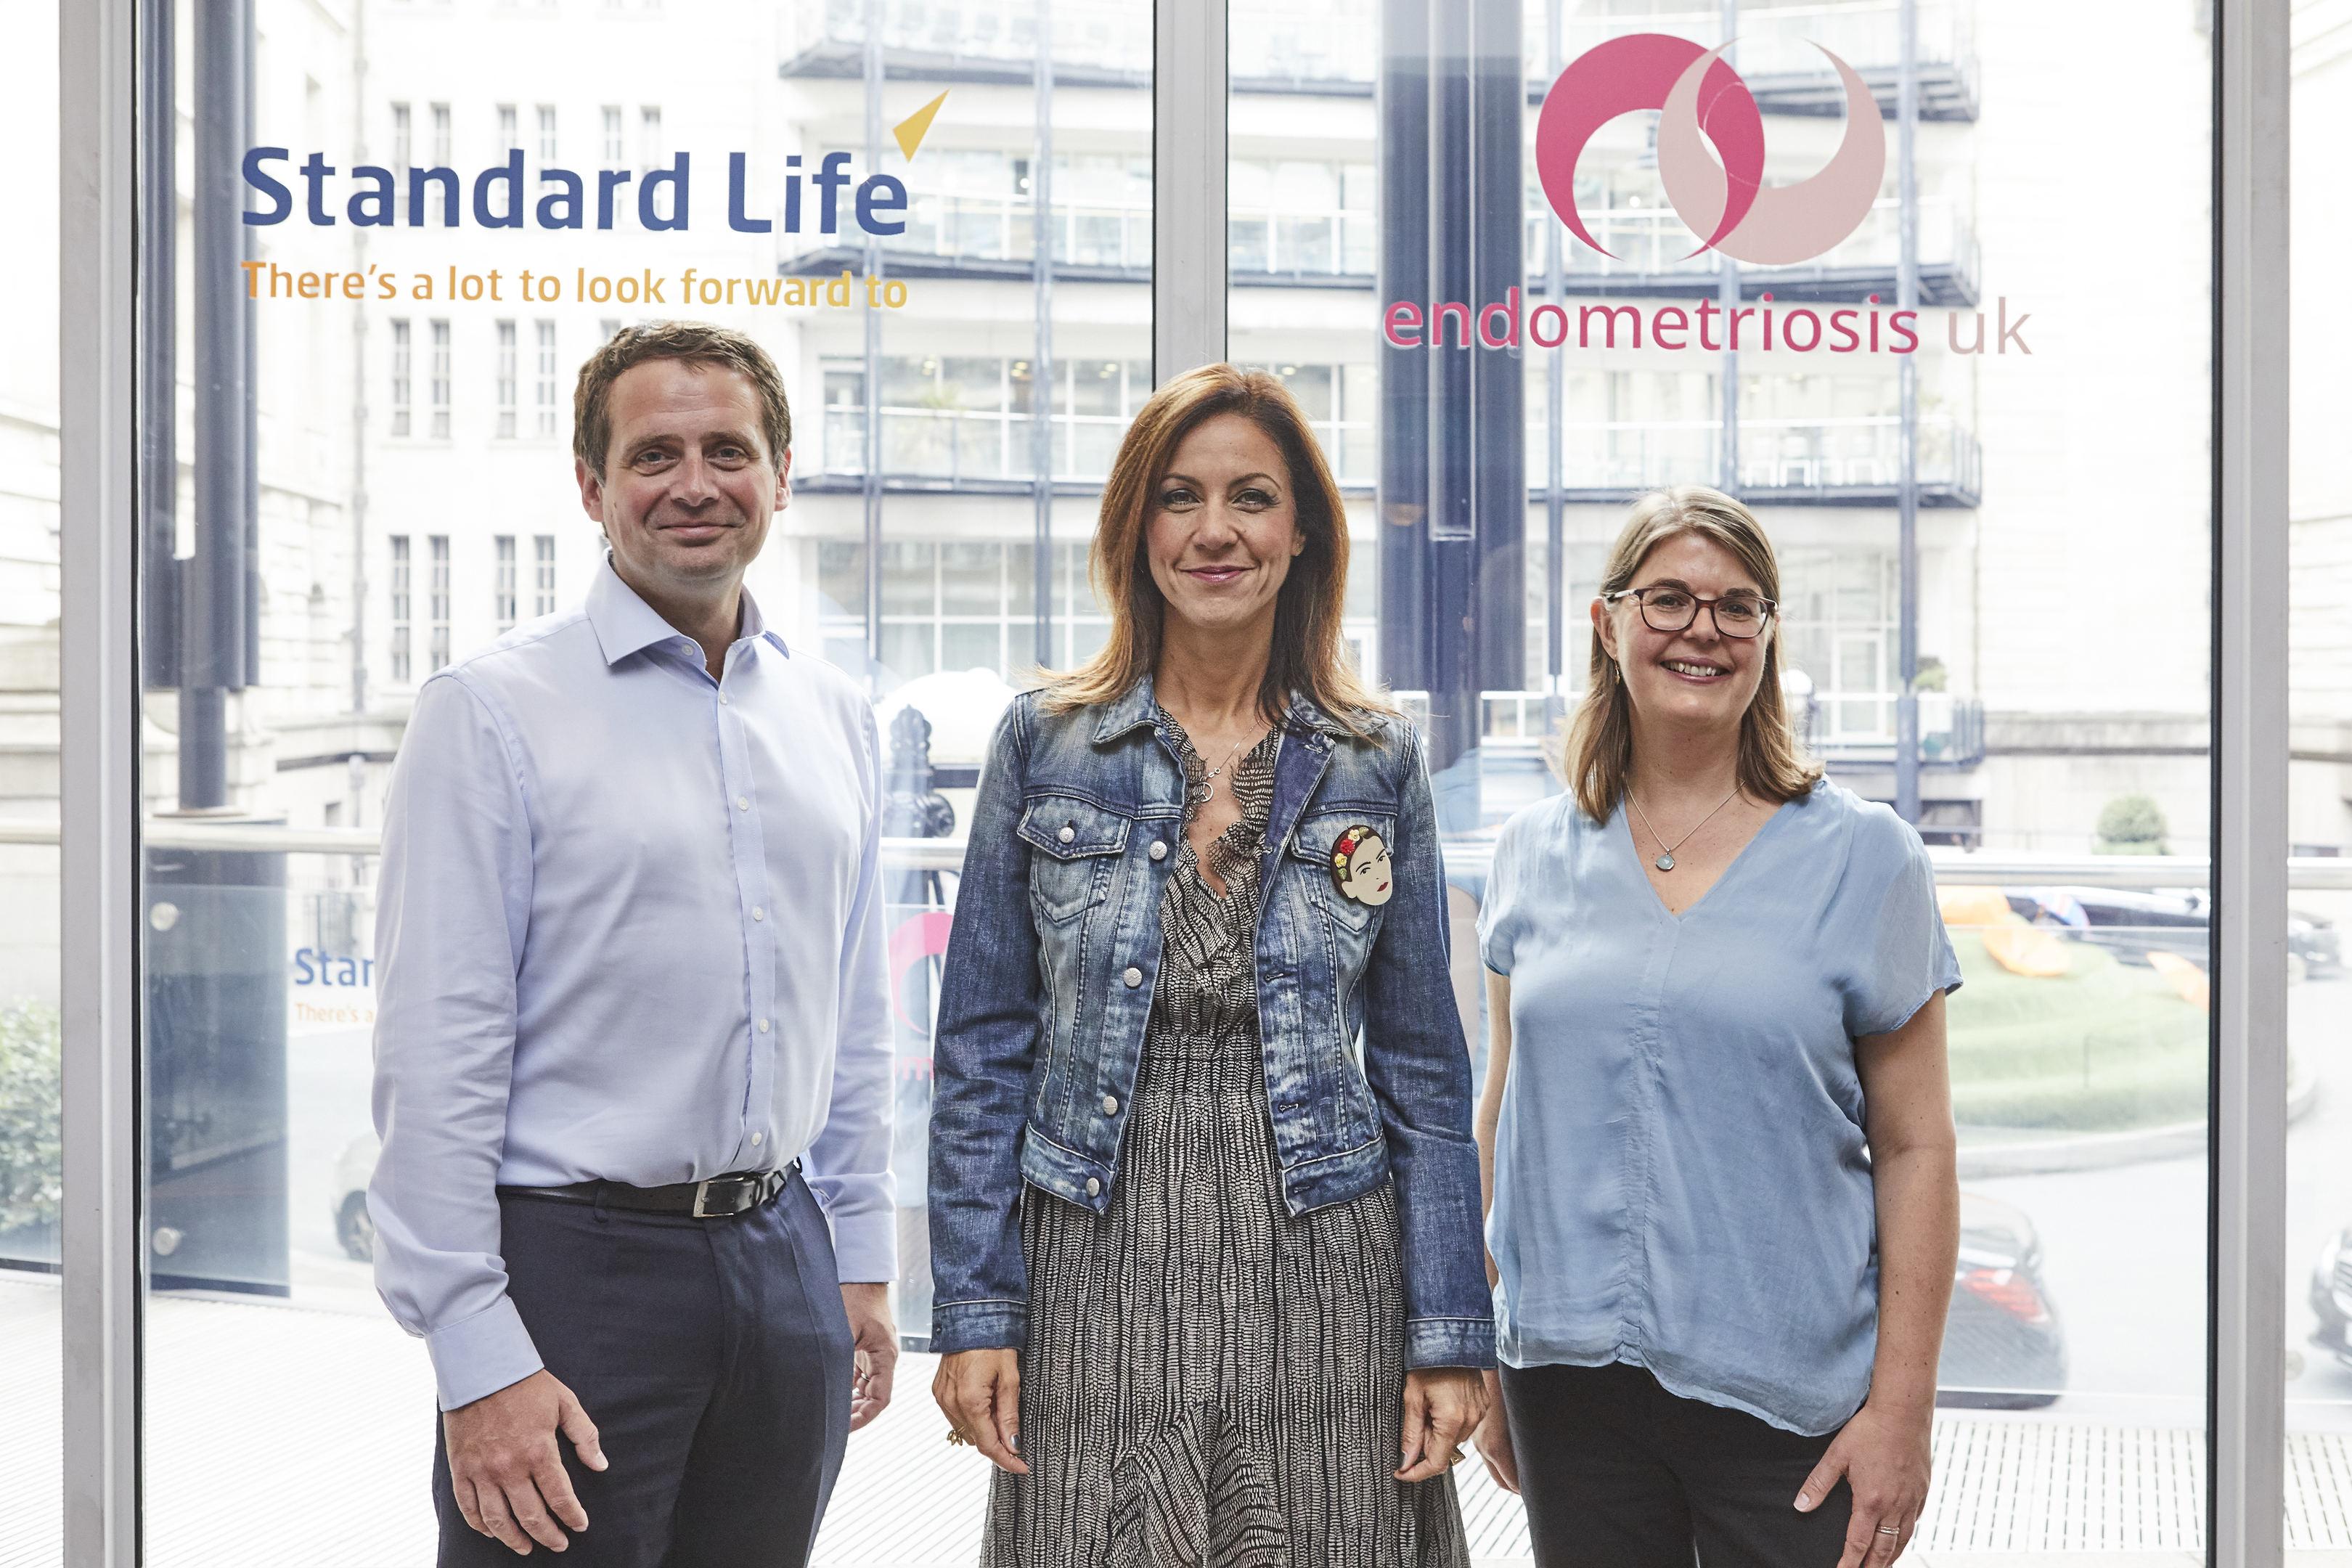 Barry O'Dwyer, CEO of Standard Life Savings, TV presenter and Endometriosis sufferer Julia Bradbury and Emma Cox, CEO Endometriosis UK